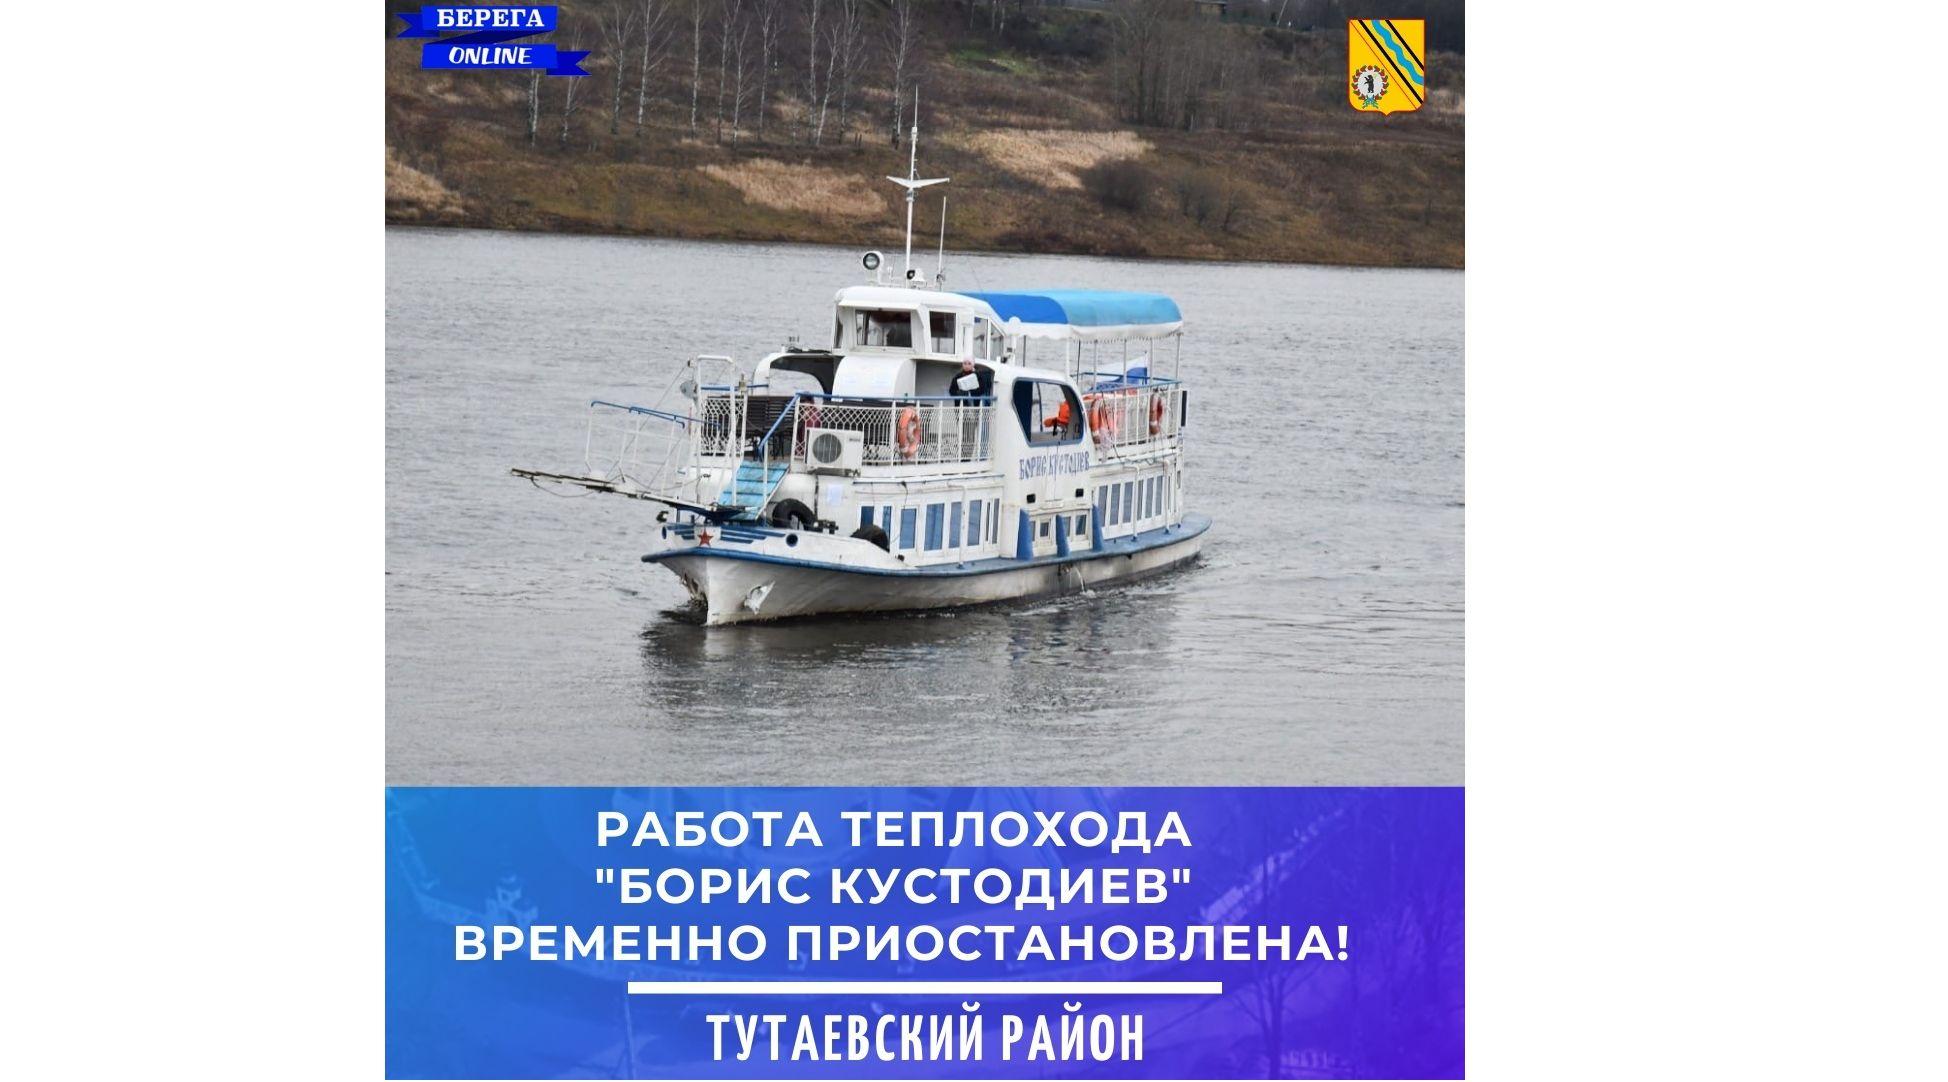 В Тутаеве приостановили работу теплохода «Борис Кустодиев»